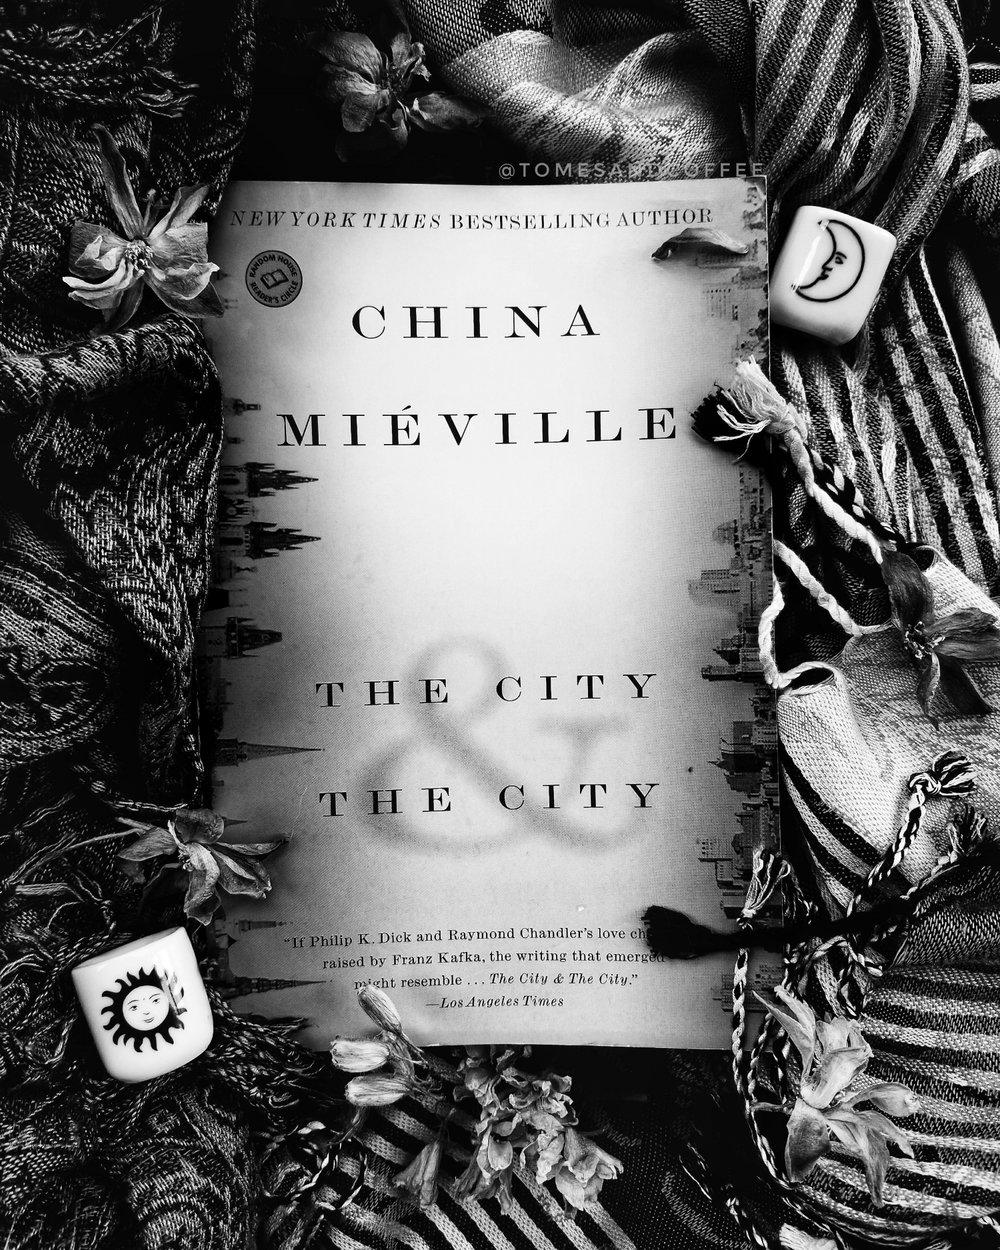 china-mieville-review-emmarkoff.jpg